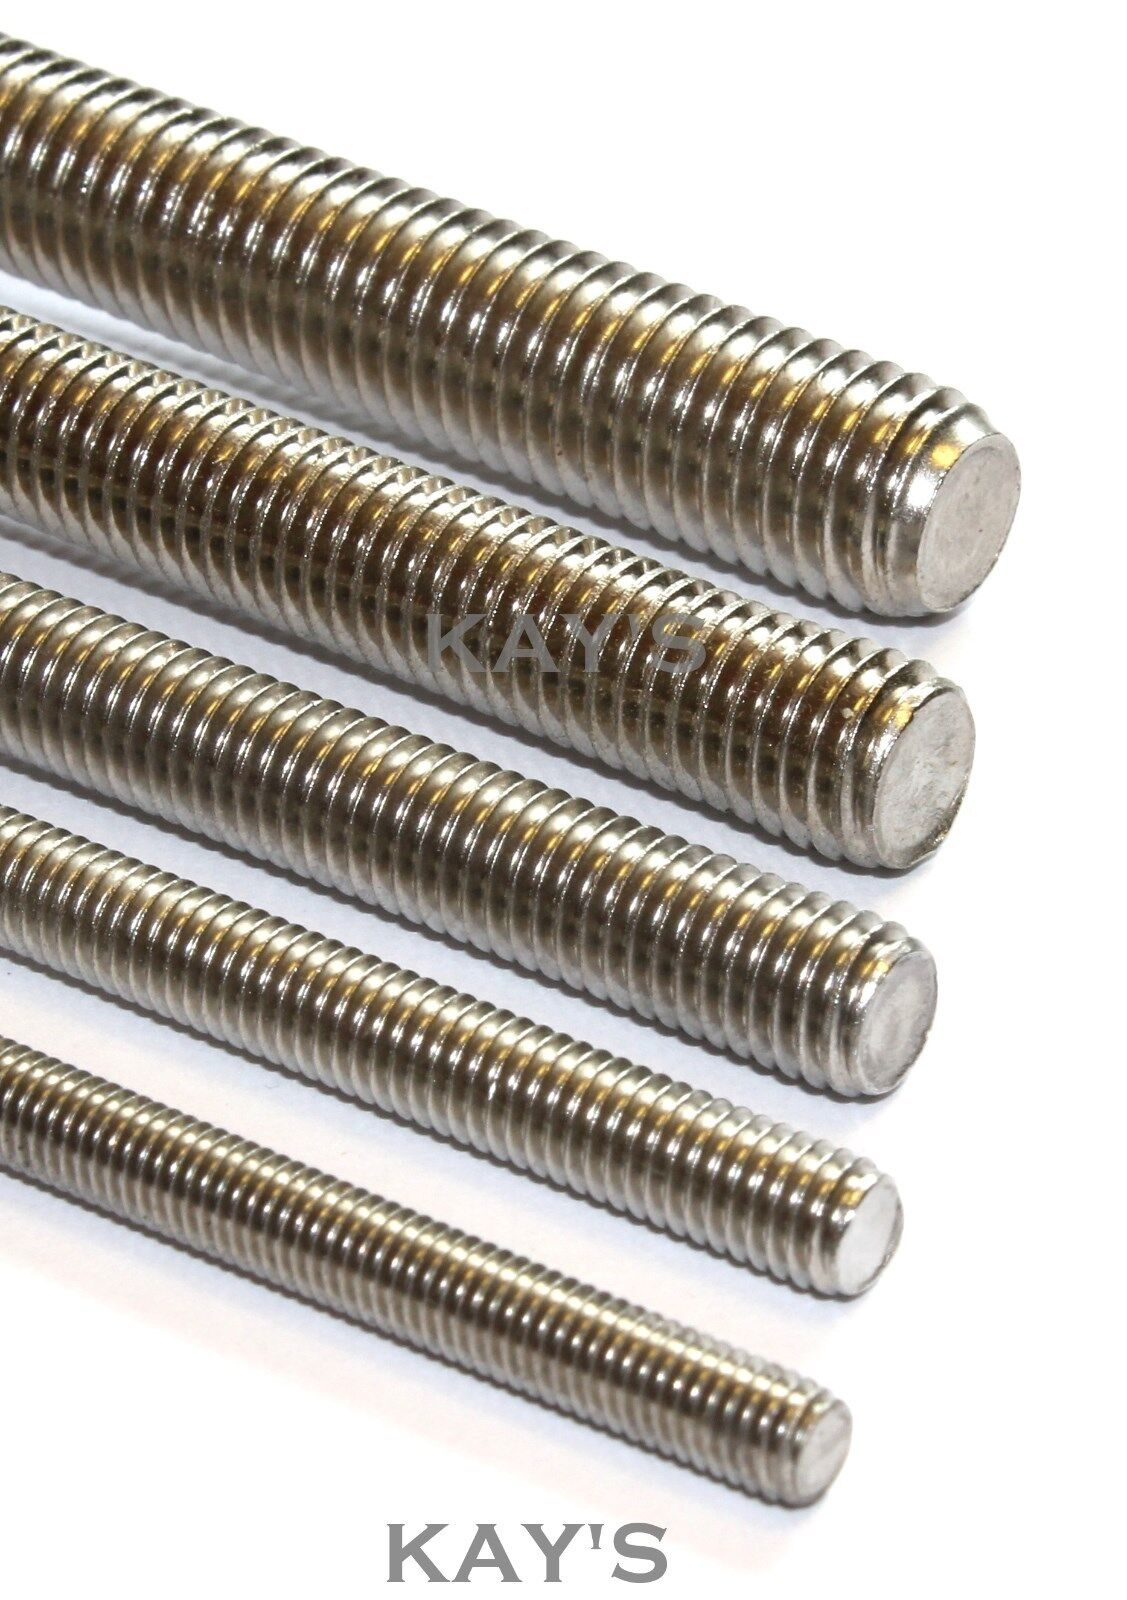 FULLY THREADED ROD BAR STUDDING ALLTHREAD M2.5,3,4,5,6,8,10mm A2 STAINLESS STEEL